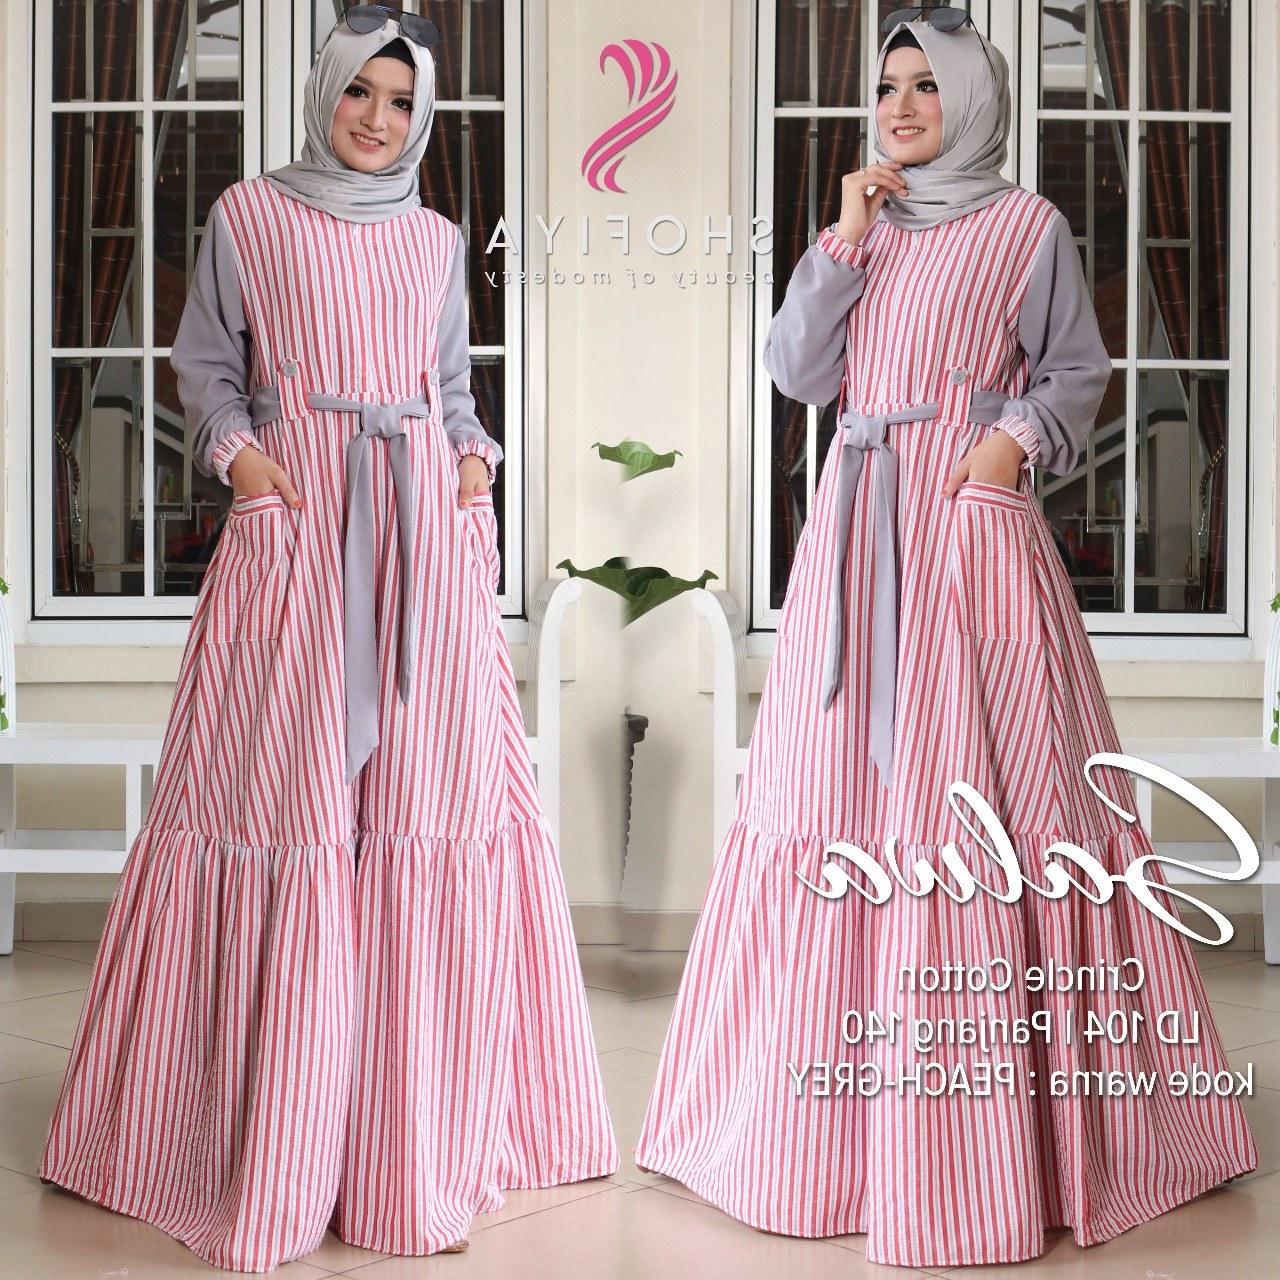 Design Model Baju Lebaran Syahrini Terbaru Zwd9 Model Baju Gamis Terbaru Lebaran Gambar islami